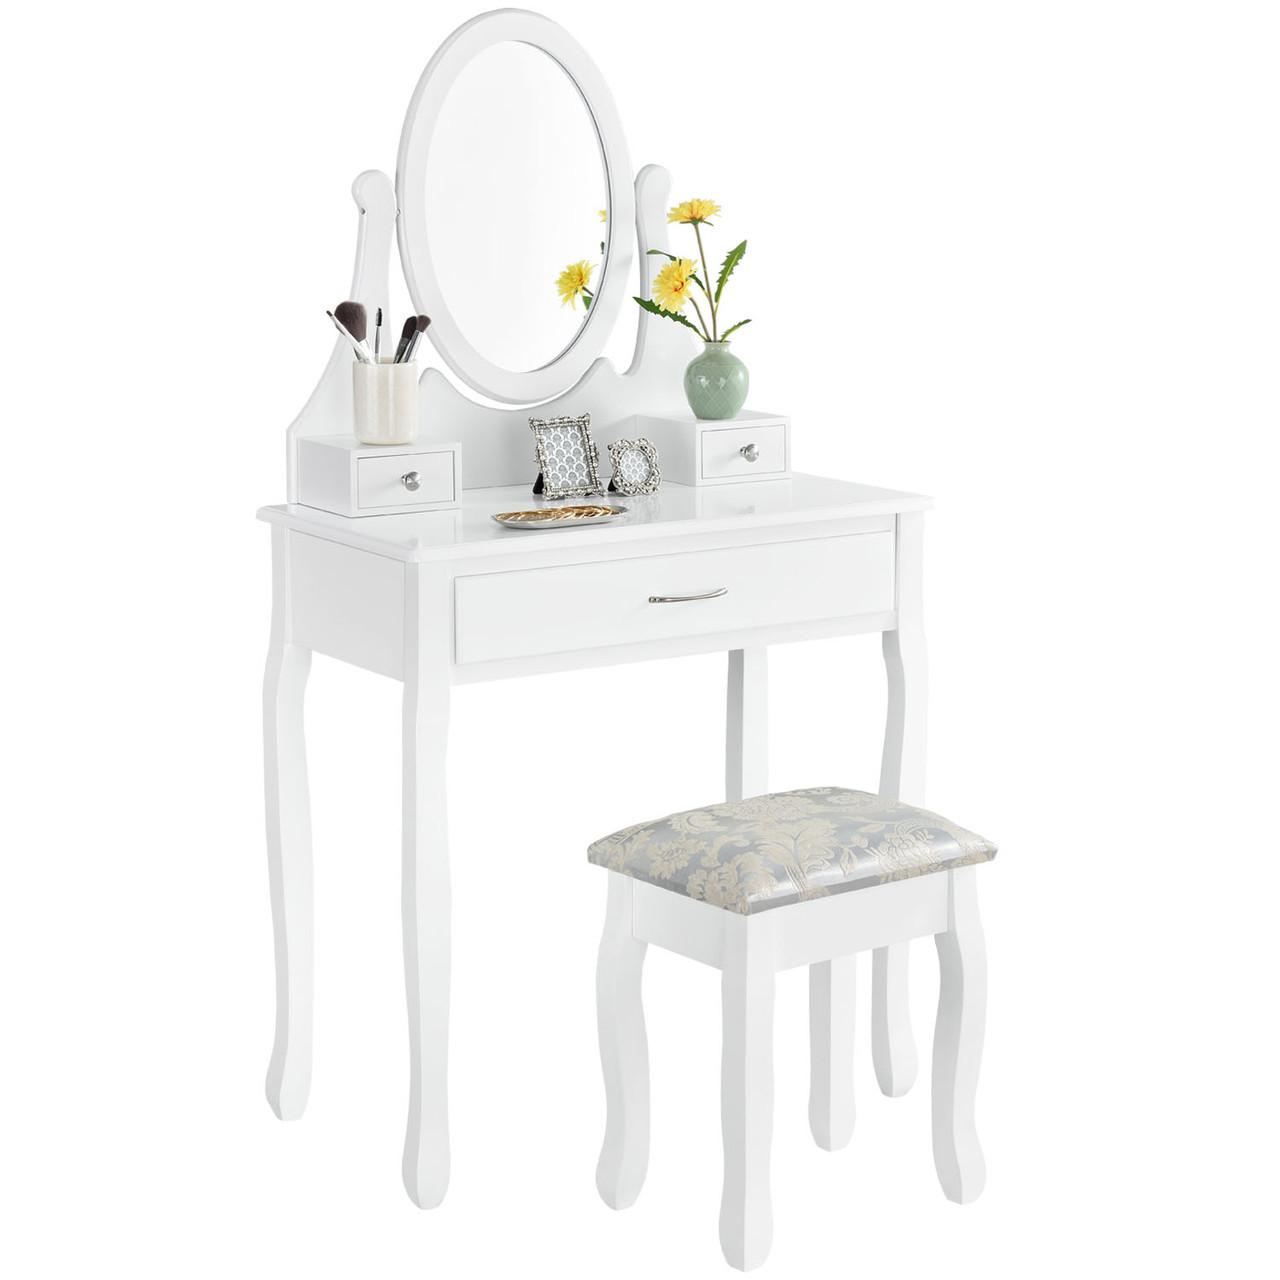 Туалетний столик Милена белый с зеркалом Трюмо в спальню